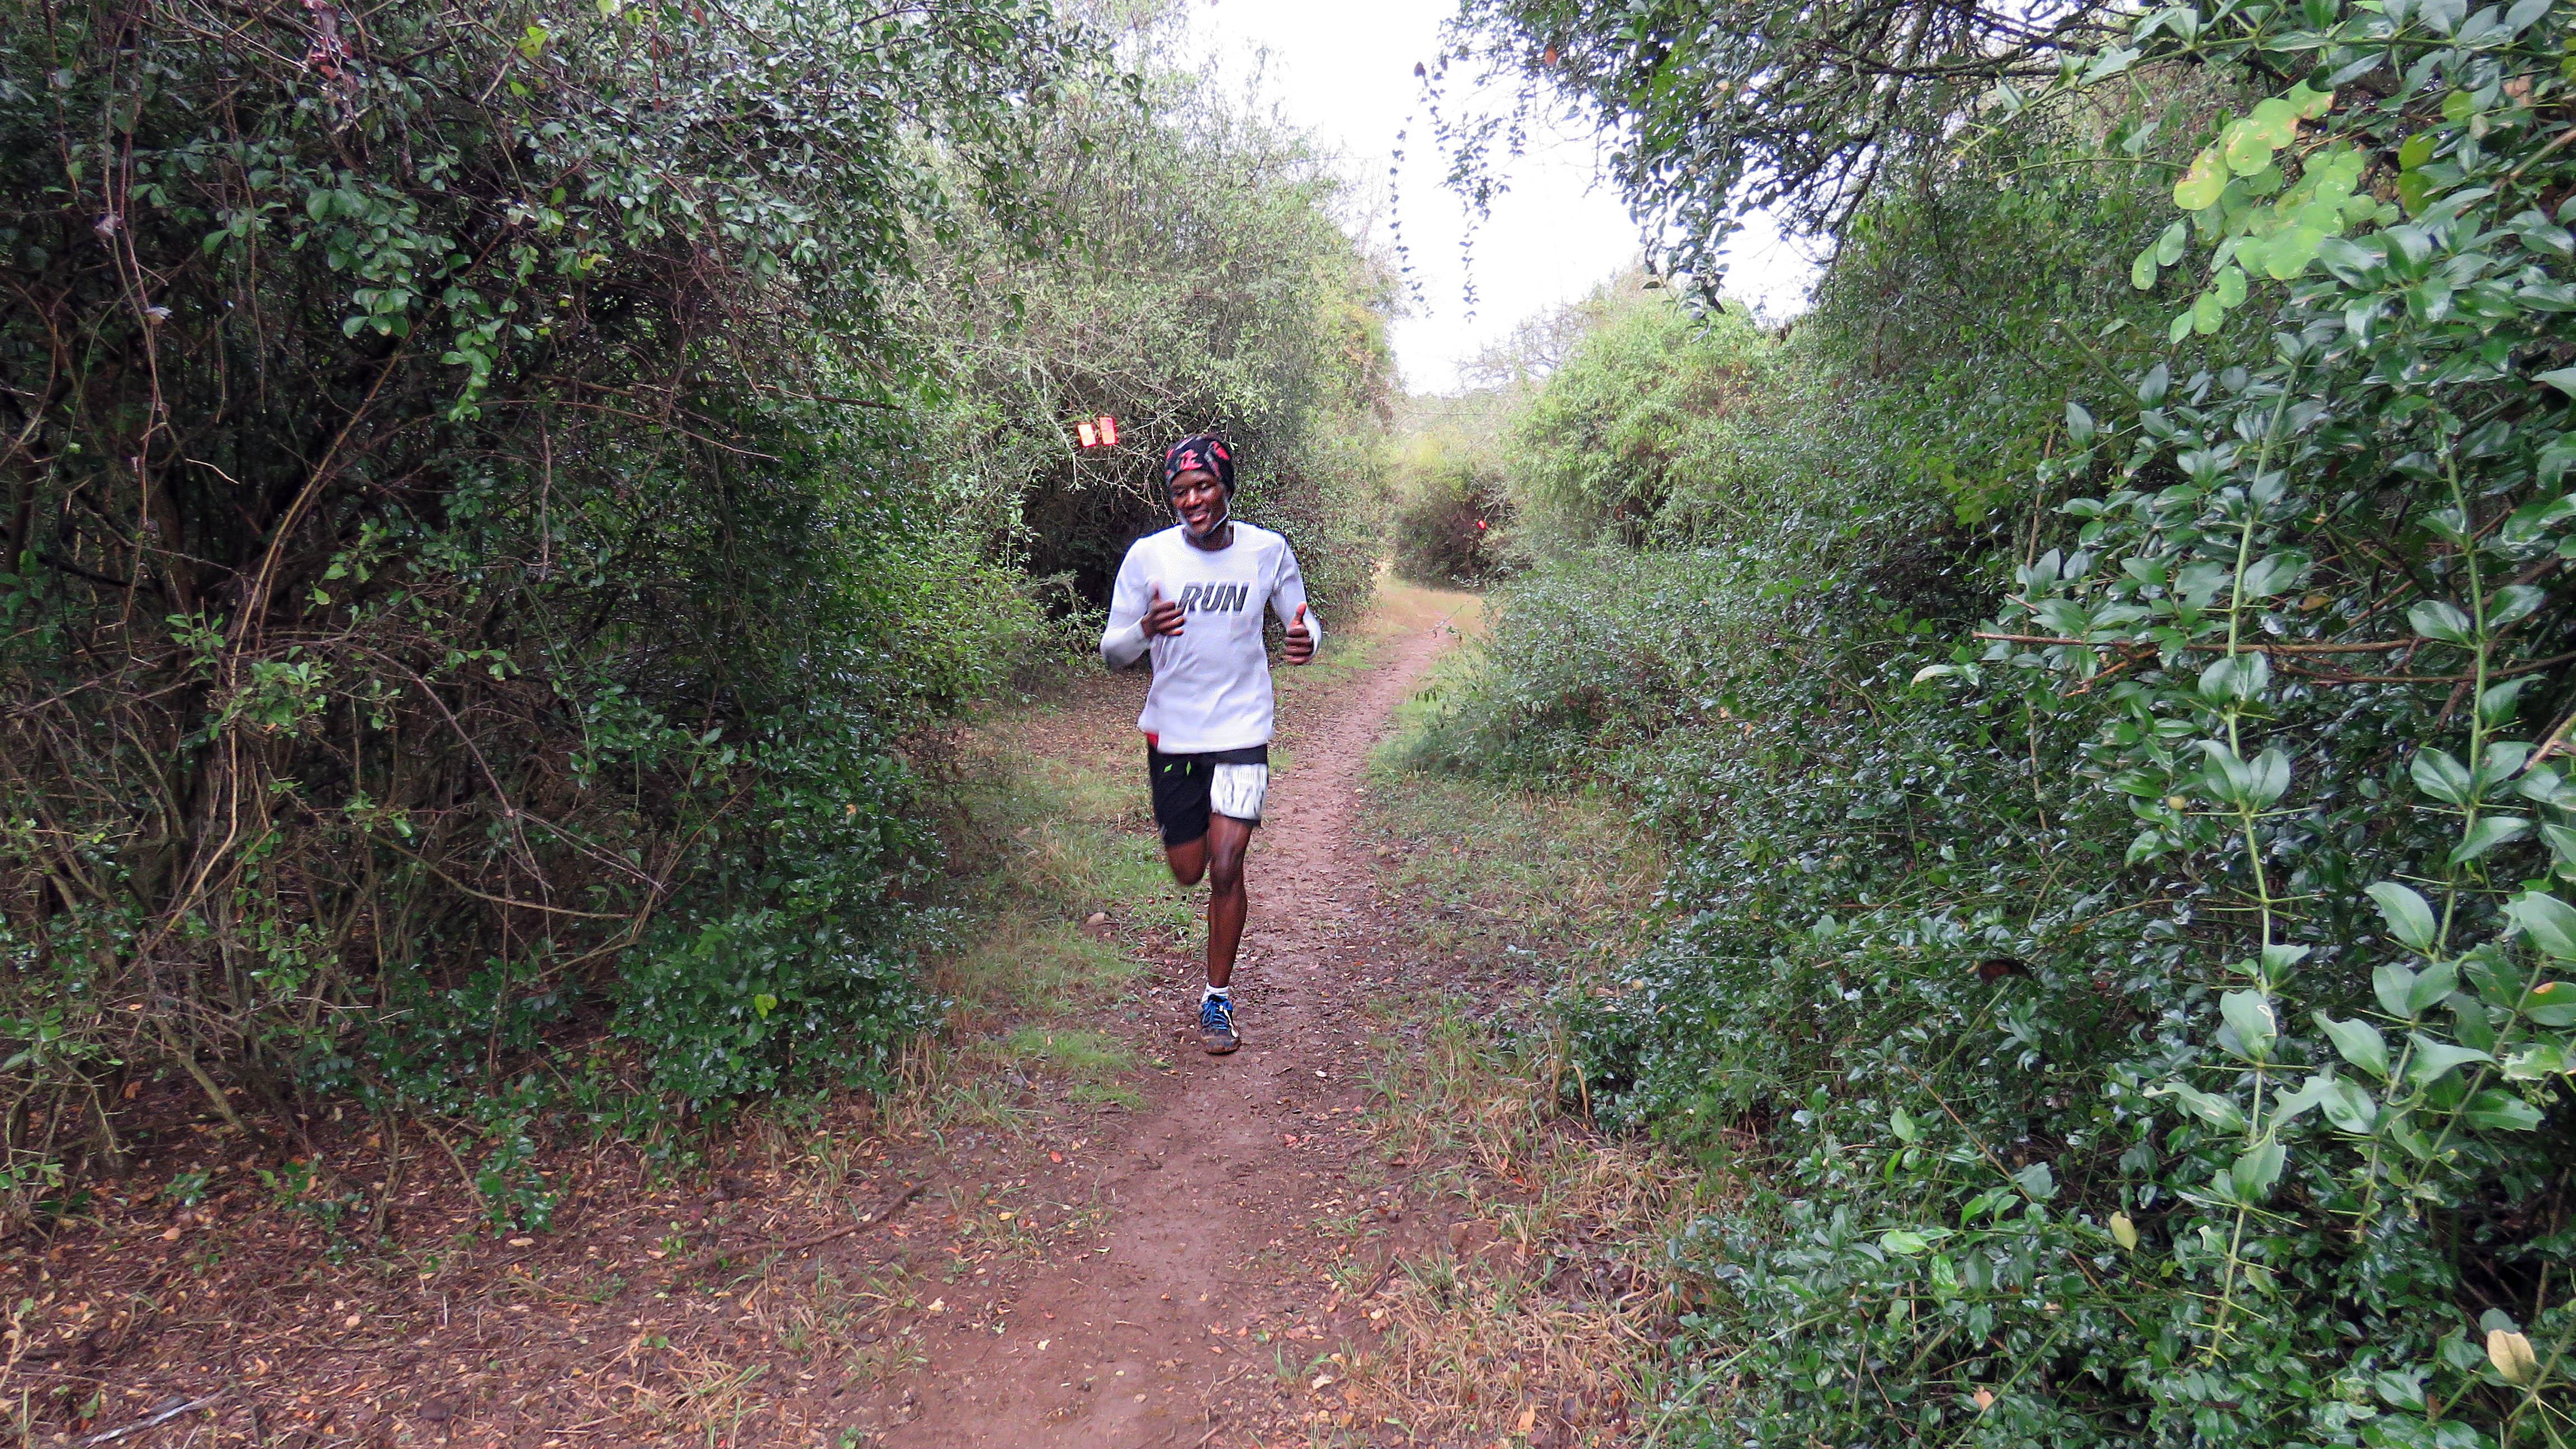 hayterdale trailrun 2018-08-05  (52)